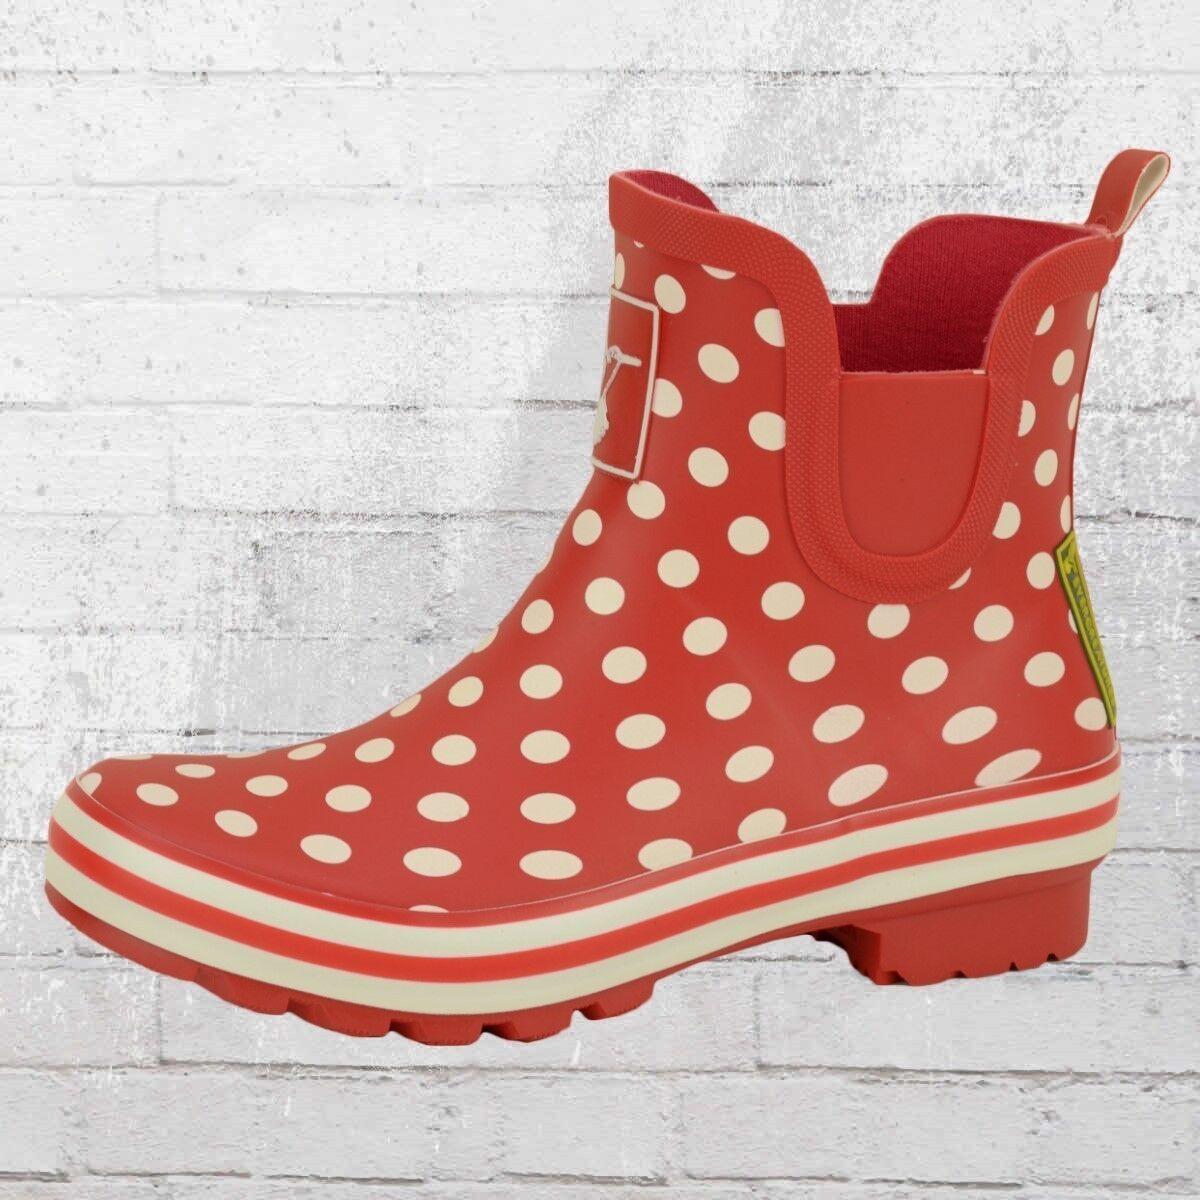 Evercreatures breve blanco botas de goma polka dots Meadow rojo blanco breve con puntos wellies 87d604